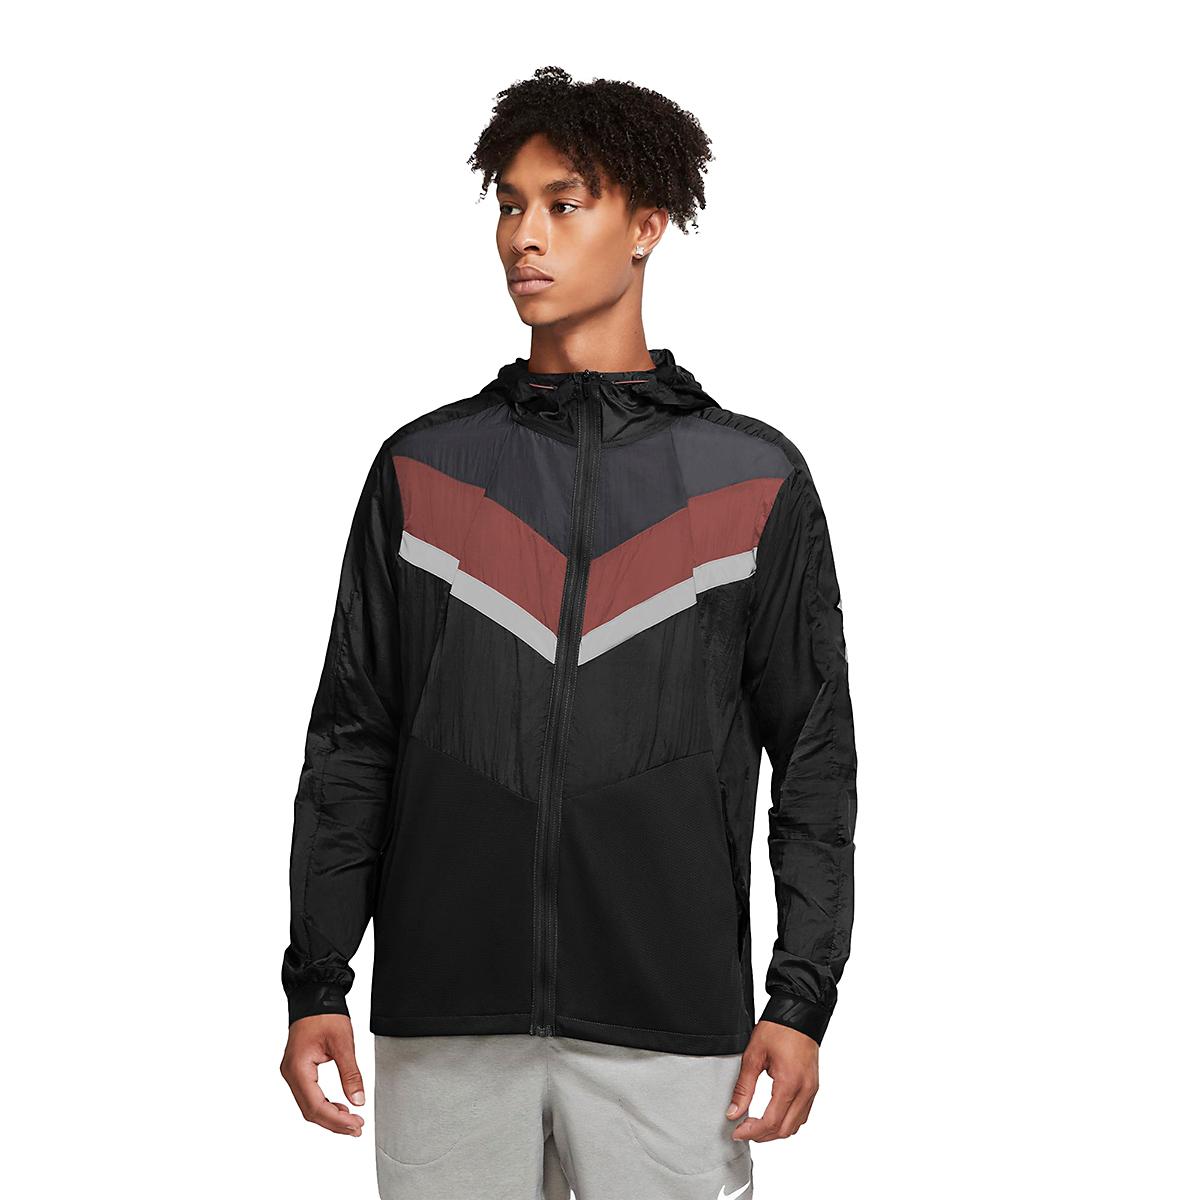 Men's Nike Windrunner Wild Run Running Jacket - Color: Black/Dark Smoke Grey/Claystone Red - Size: S, Black/Dark Smoke Grey/Claystone Red, large, image 1